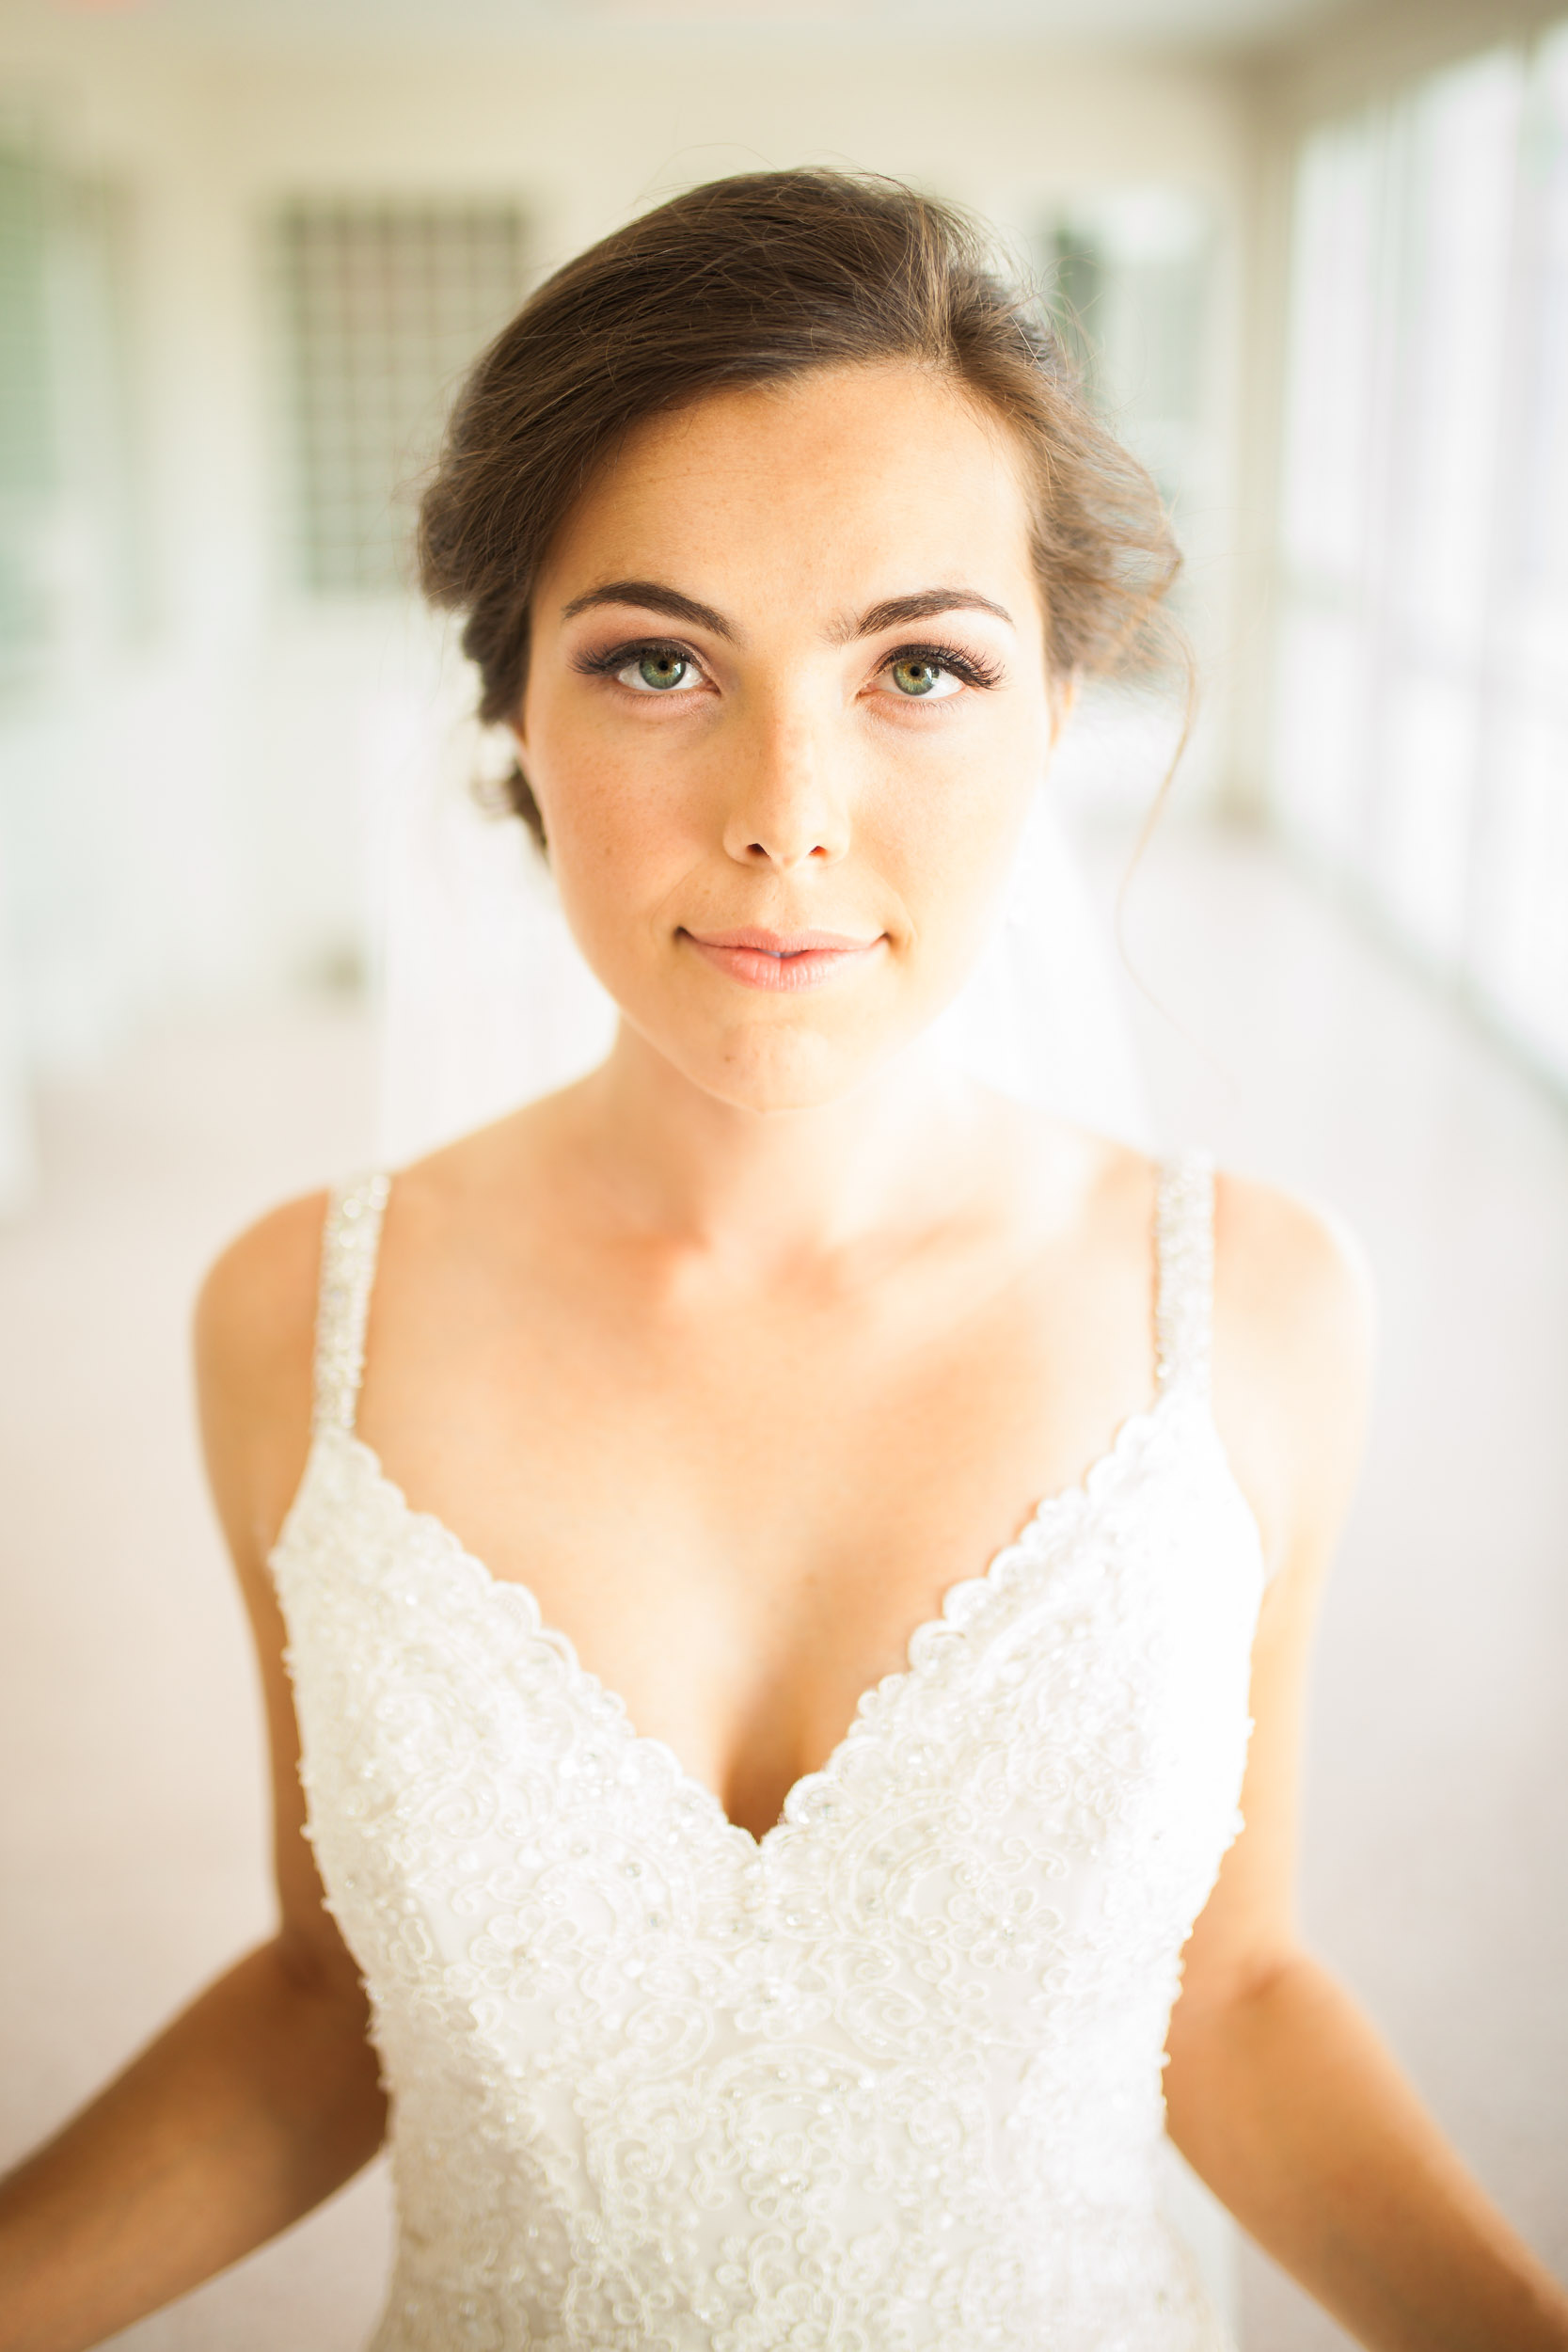 Flordia-Wedding-Photography-31.jpg